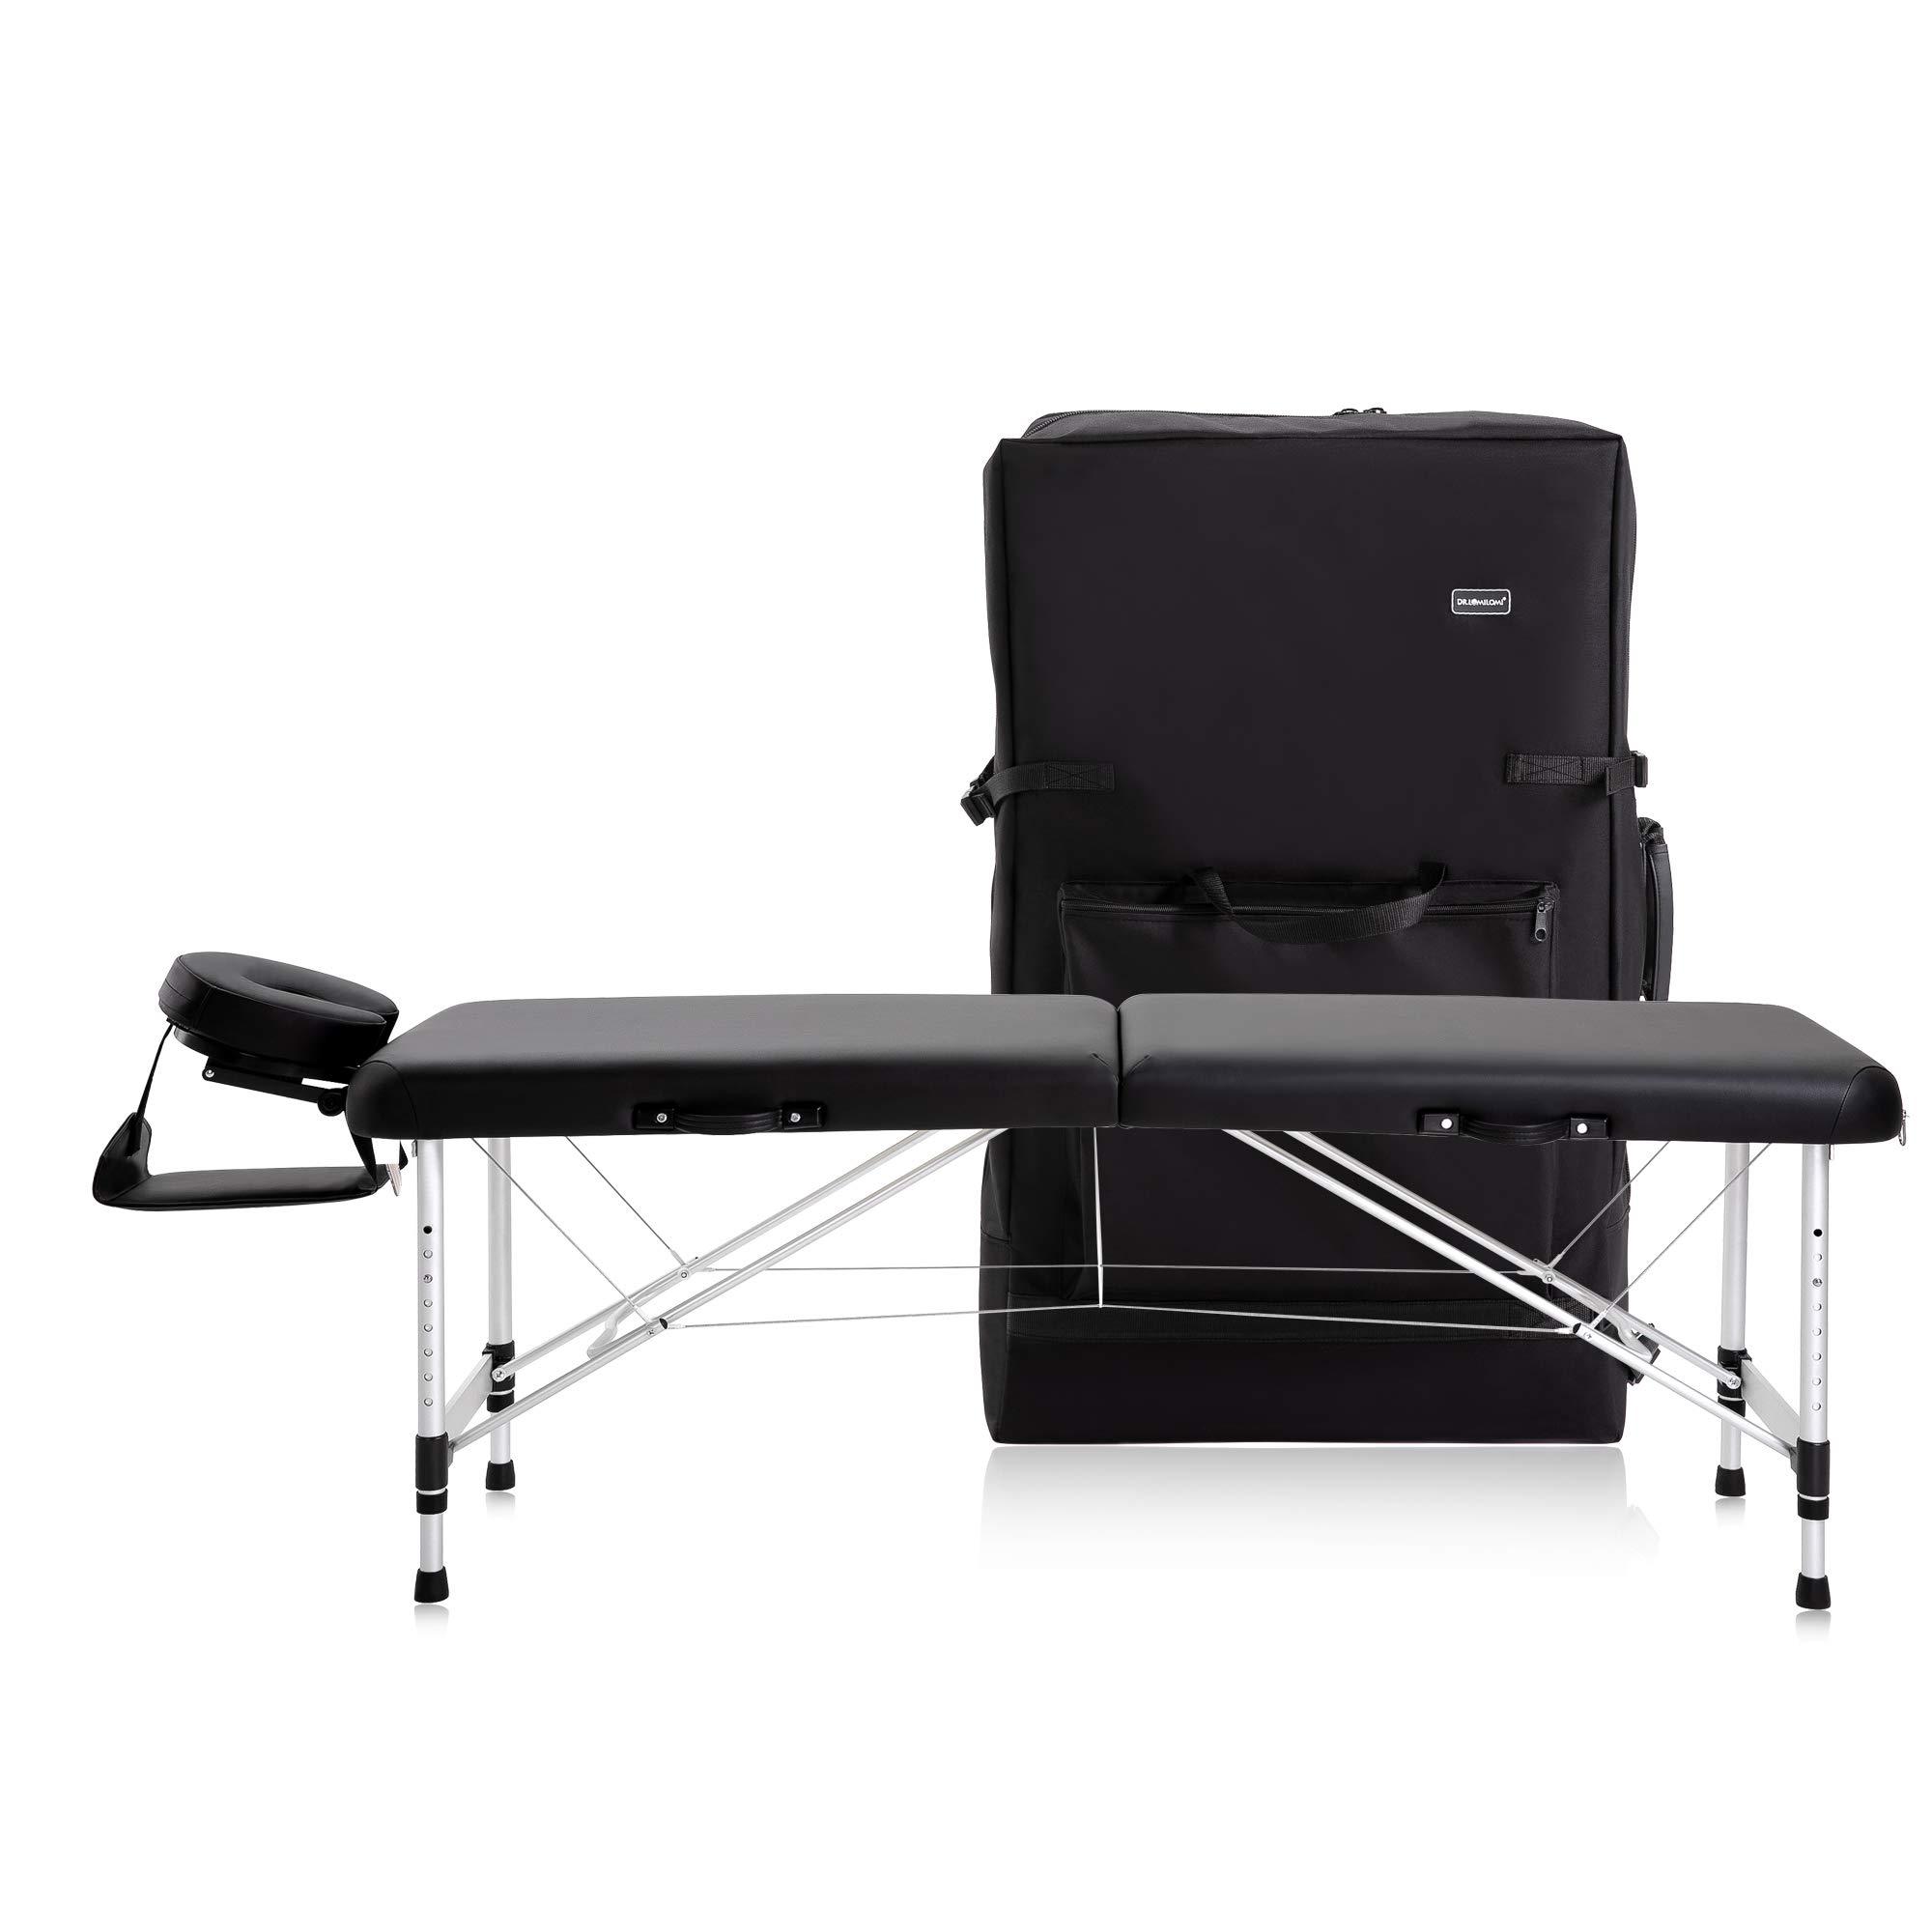 "DR.LOMILOMI Ultra-light Travel-sized Aluminum Portable Massage Table Spa Bed 302 - HALIA (W22"" X L71"", Black)"